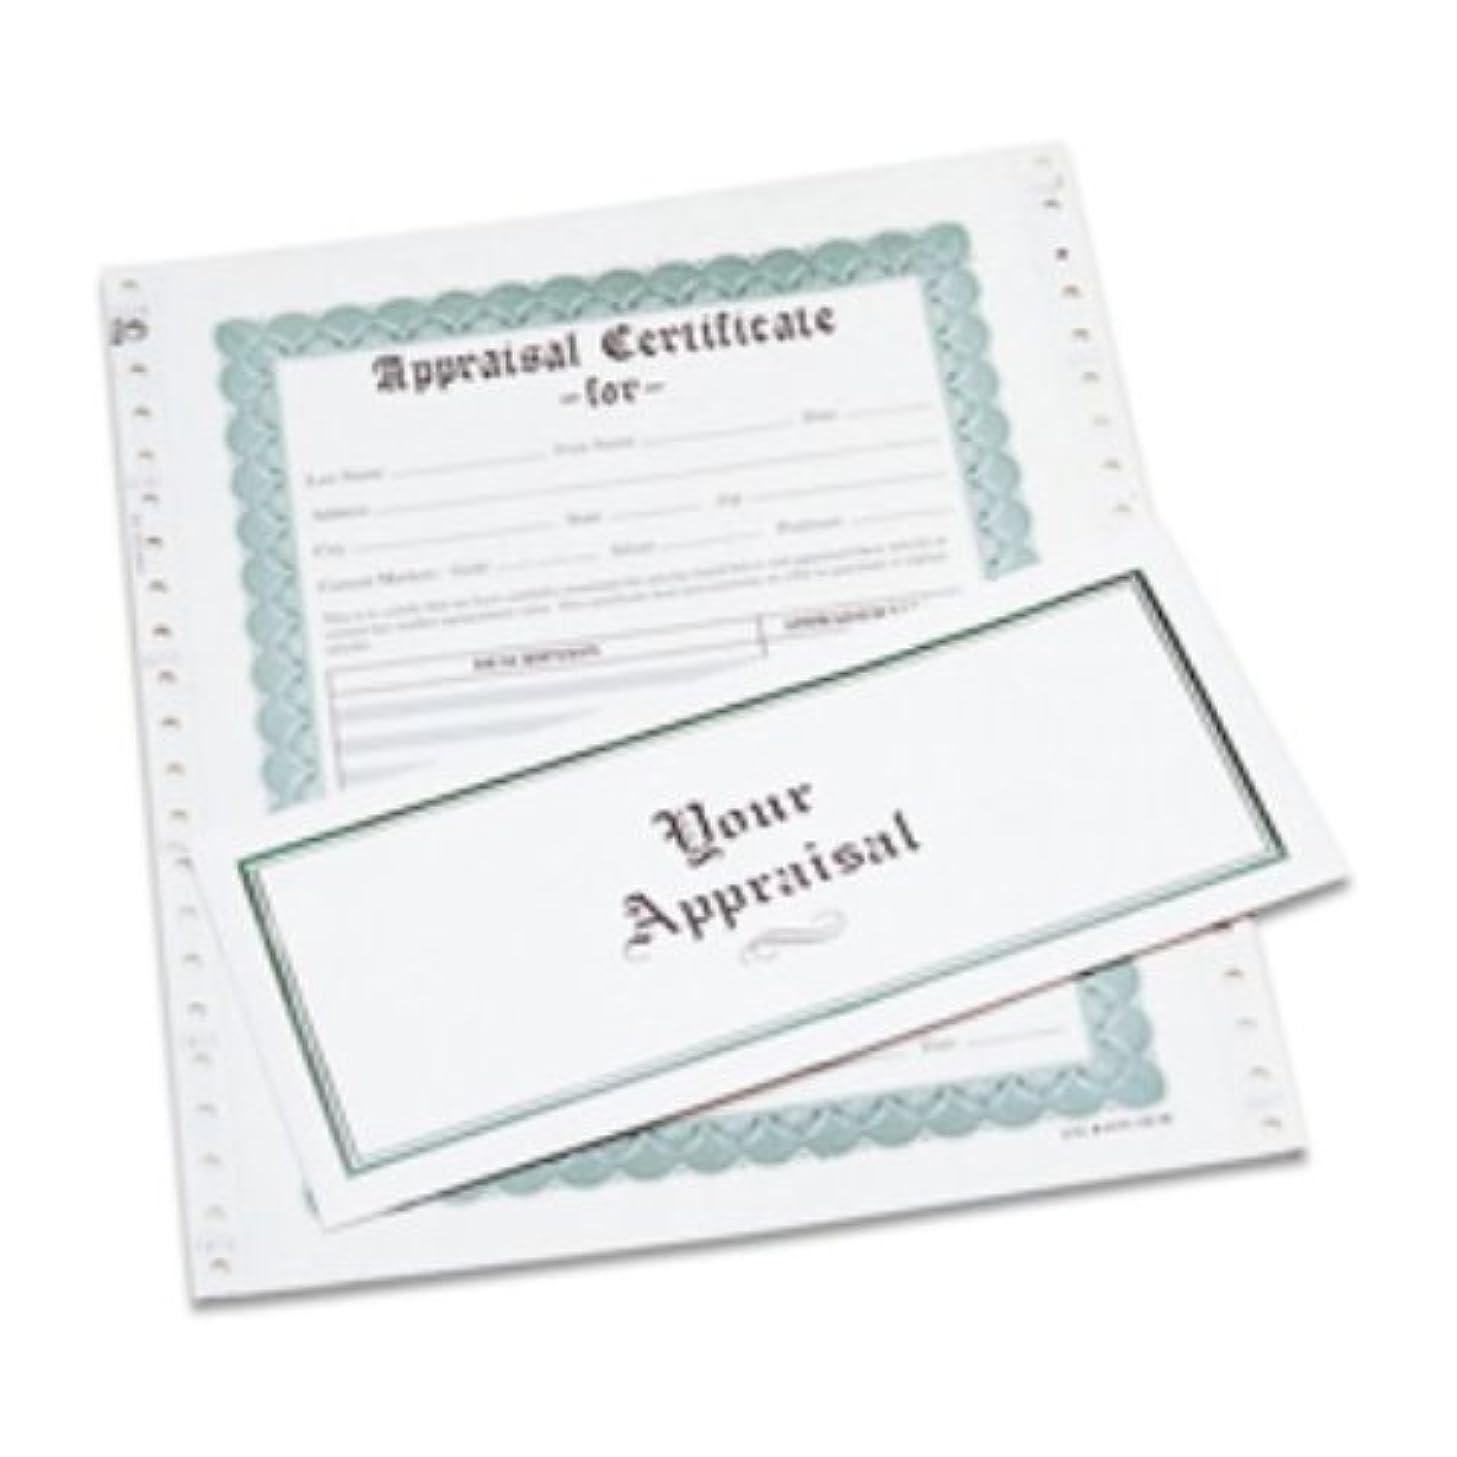 Appraisal Certificates, Box of 100   APR-100.00